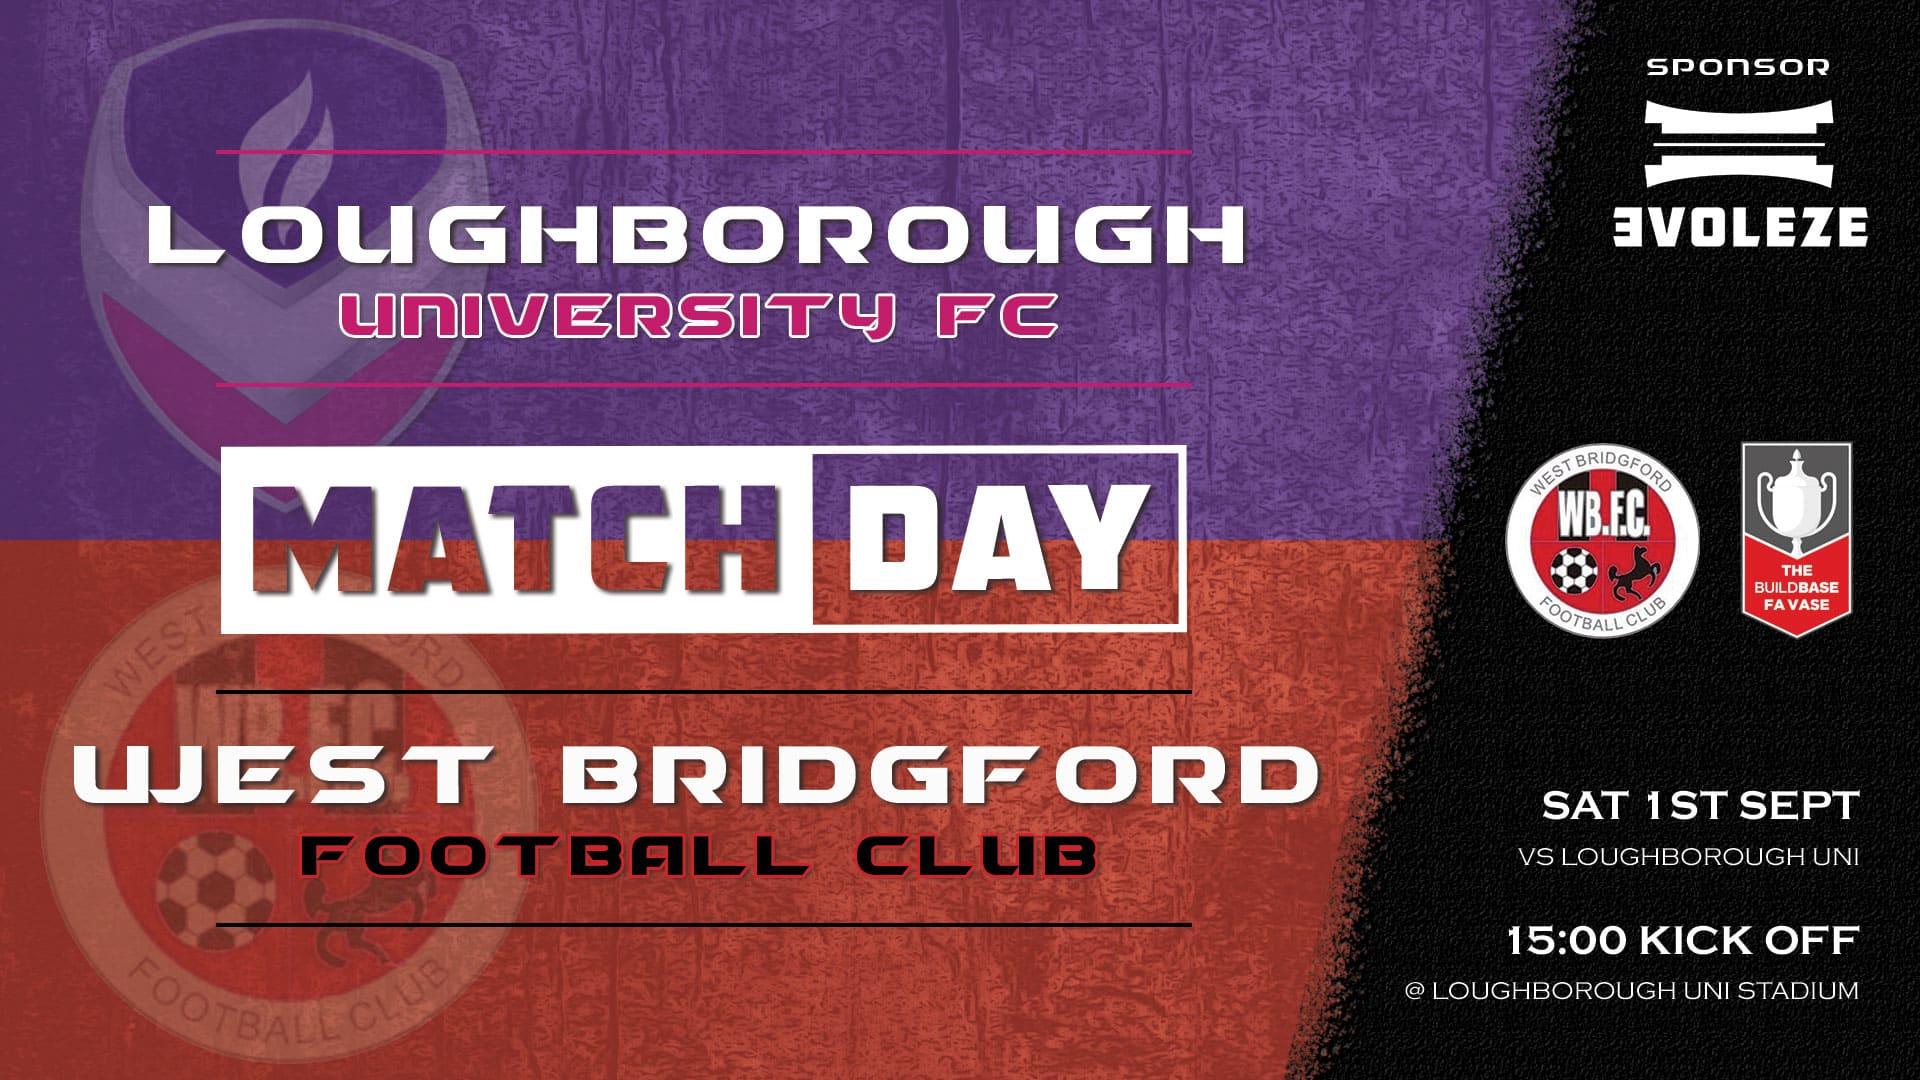 match day - West Bridgford FC